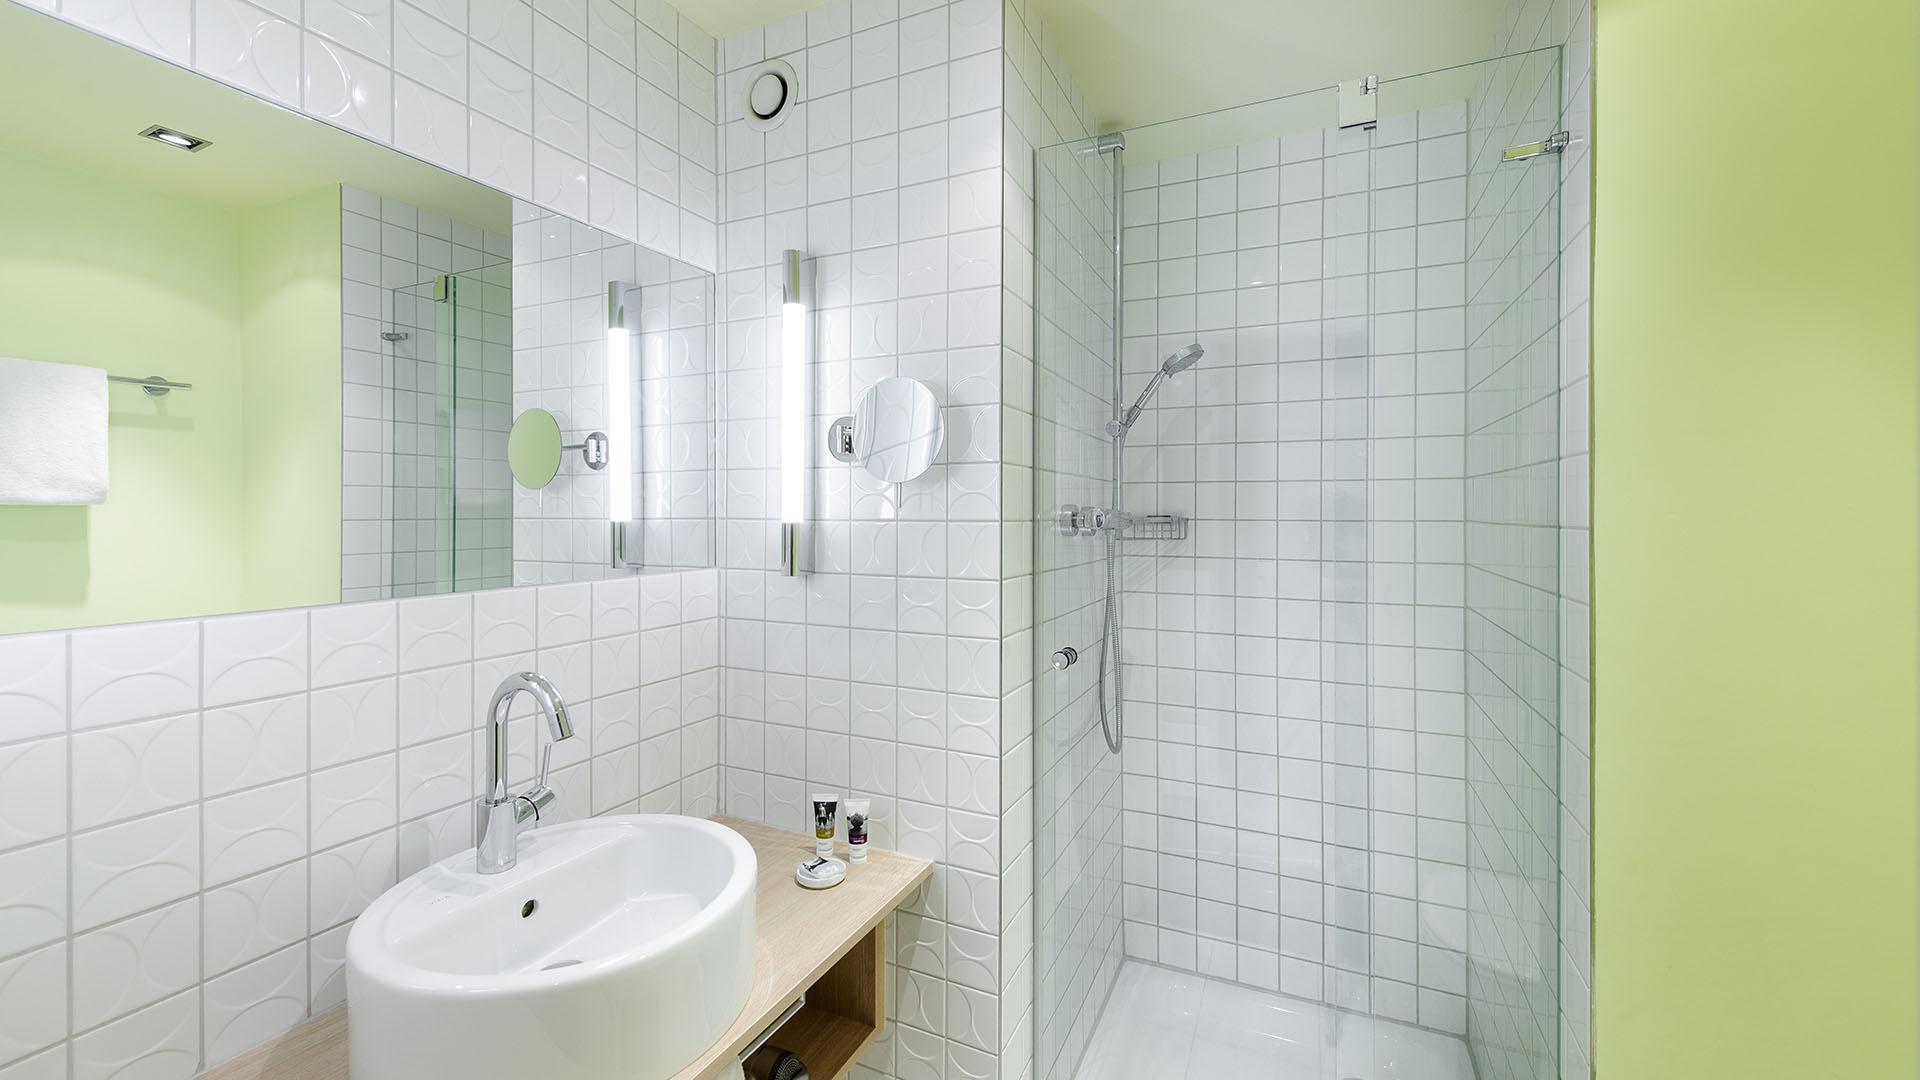 Mercure Hotel Bristol Stuttgart Badezimmer gruen - EVENT Hotels ...